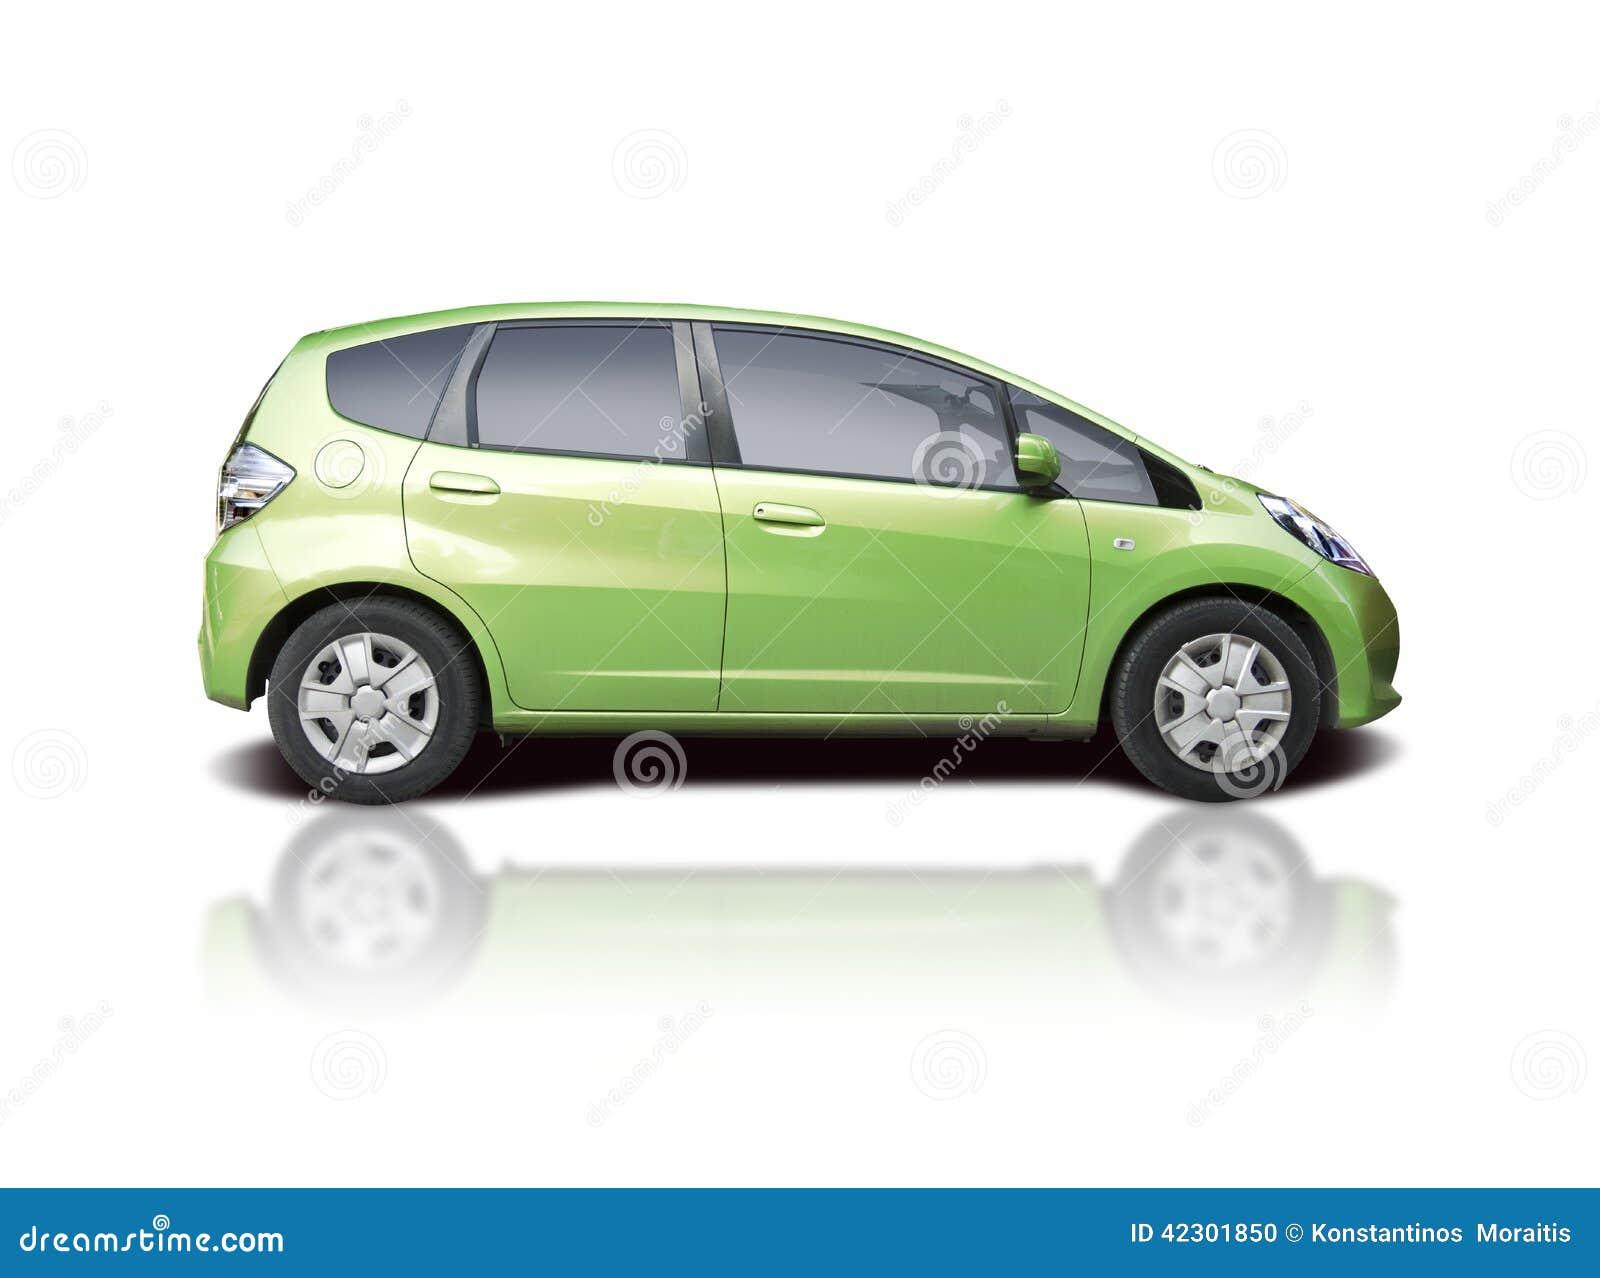 Honda Jazz Stock Photo Image Of Honda Green Transportation 42301850